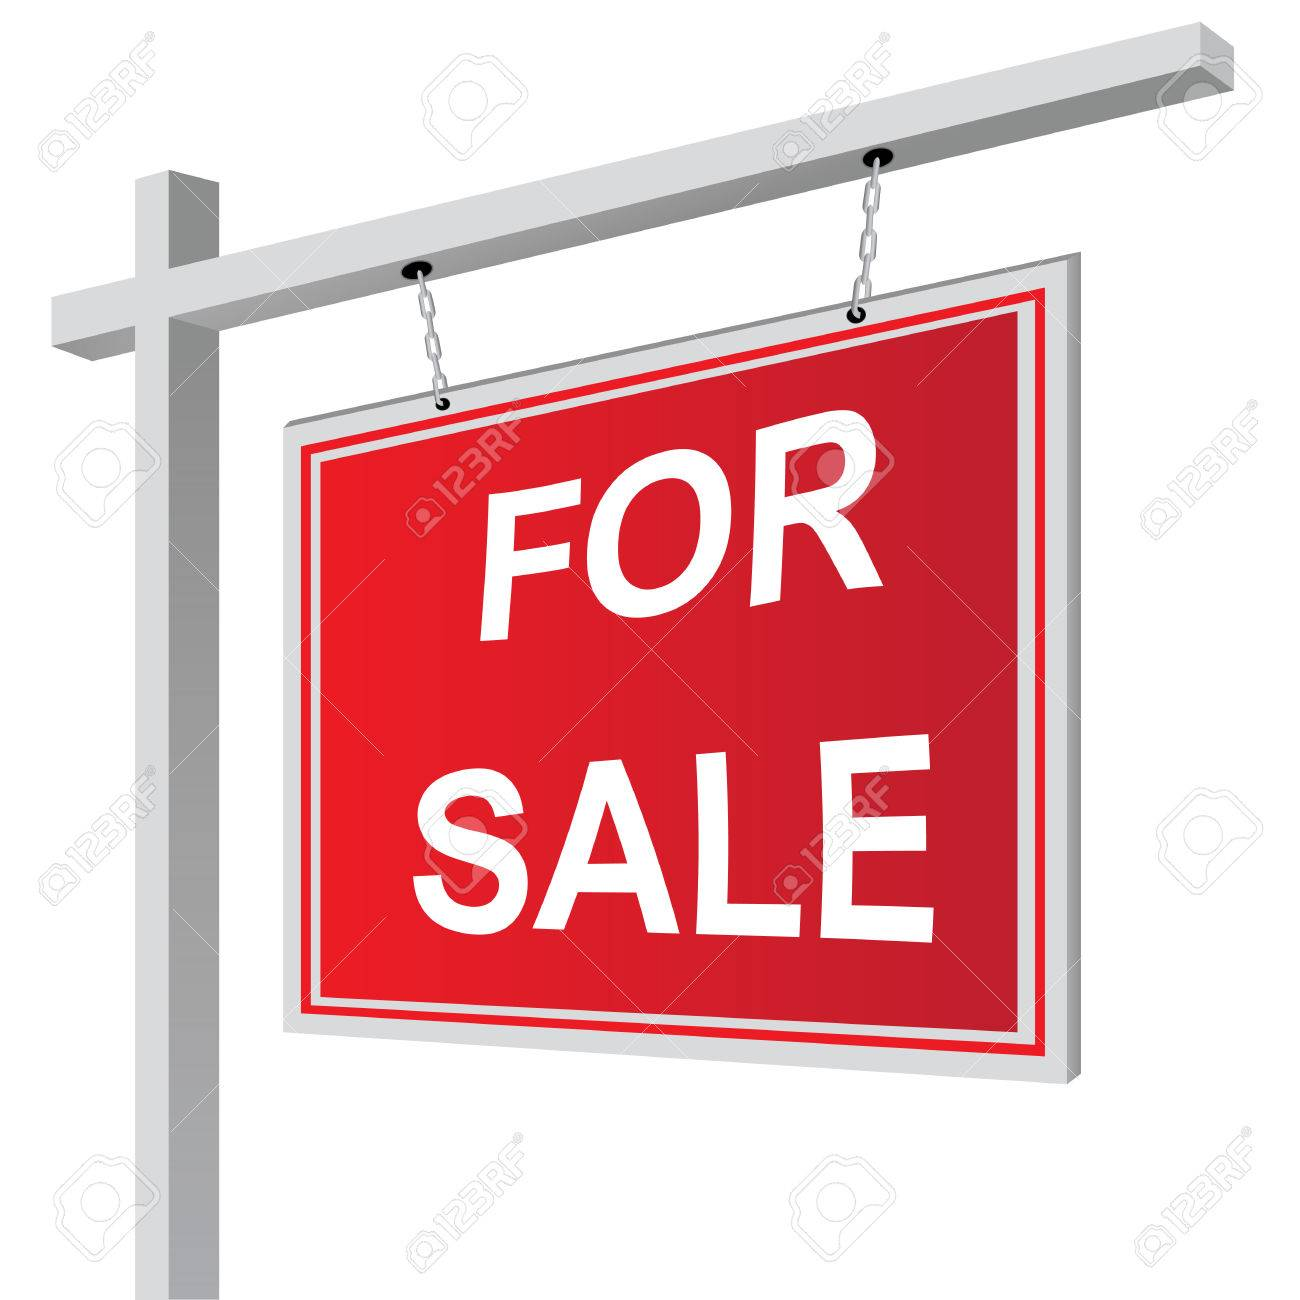 For sale sign vector illustration - 39571045